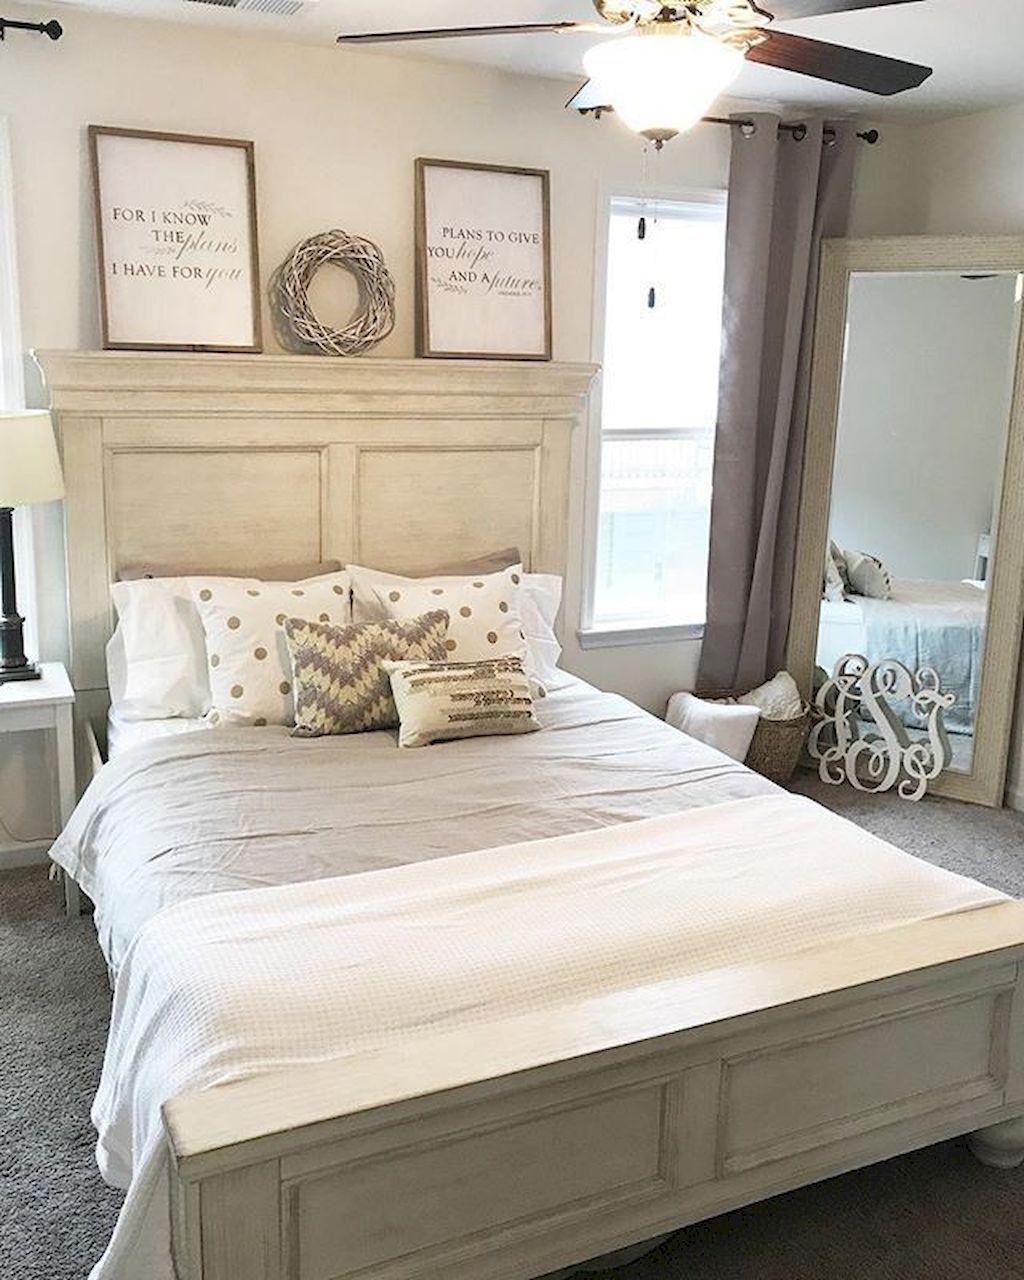 5 Calming Bedroom Design Ideas The Budget Decorator: 80 Amazing Farmhouse Bedroom Decor Ideas On A Budget